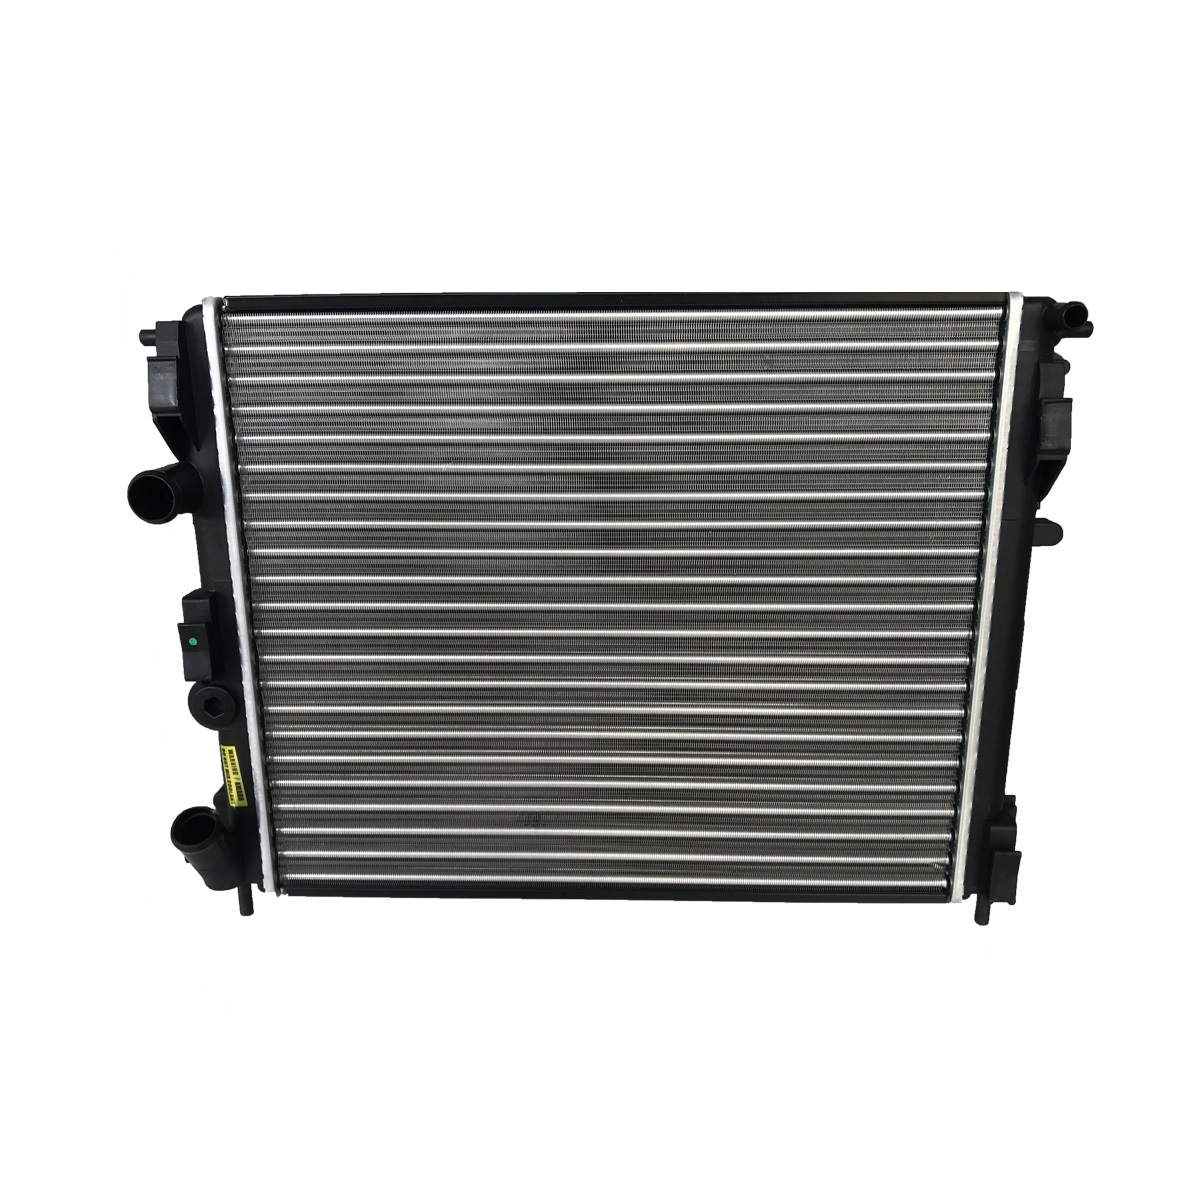 Radiador de Água Renault Clio 1.0 1.6 99> C/S Ar/ Symbol/ Logan/ Sandero 1.0 1.6 16V 07-12 C/S Ar Mec.